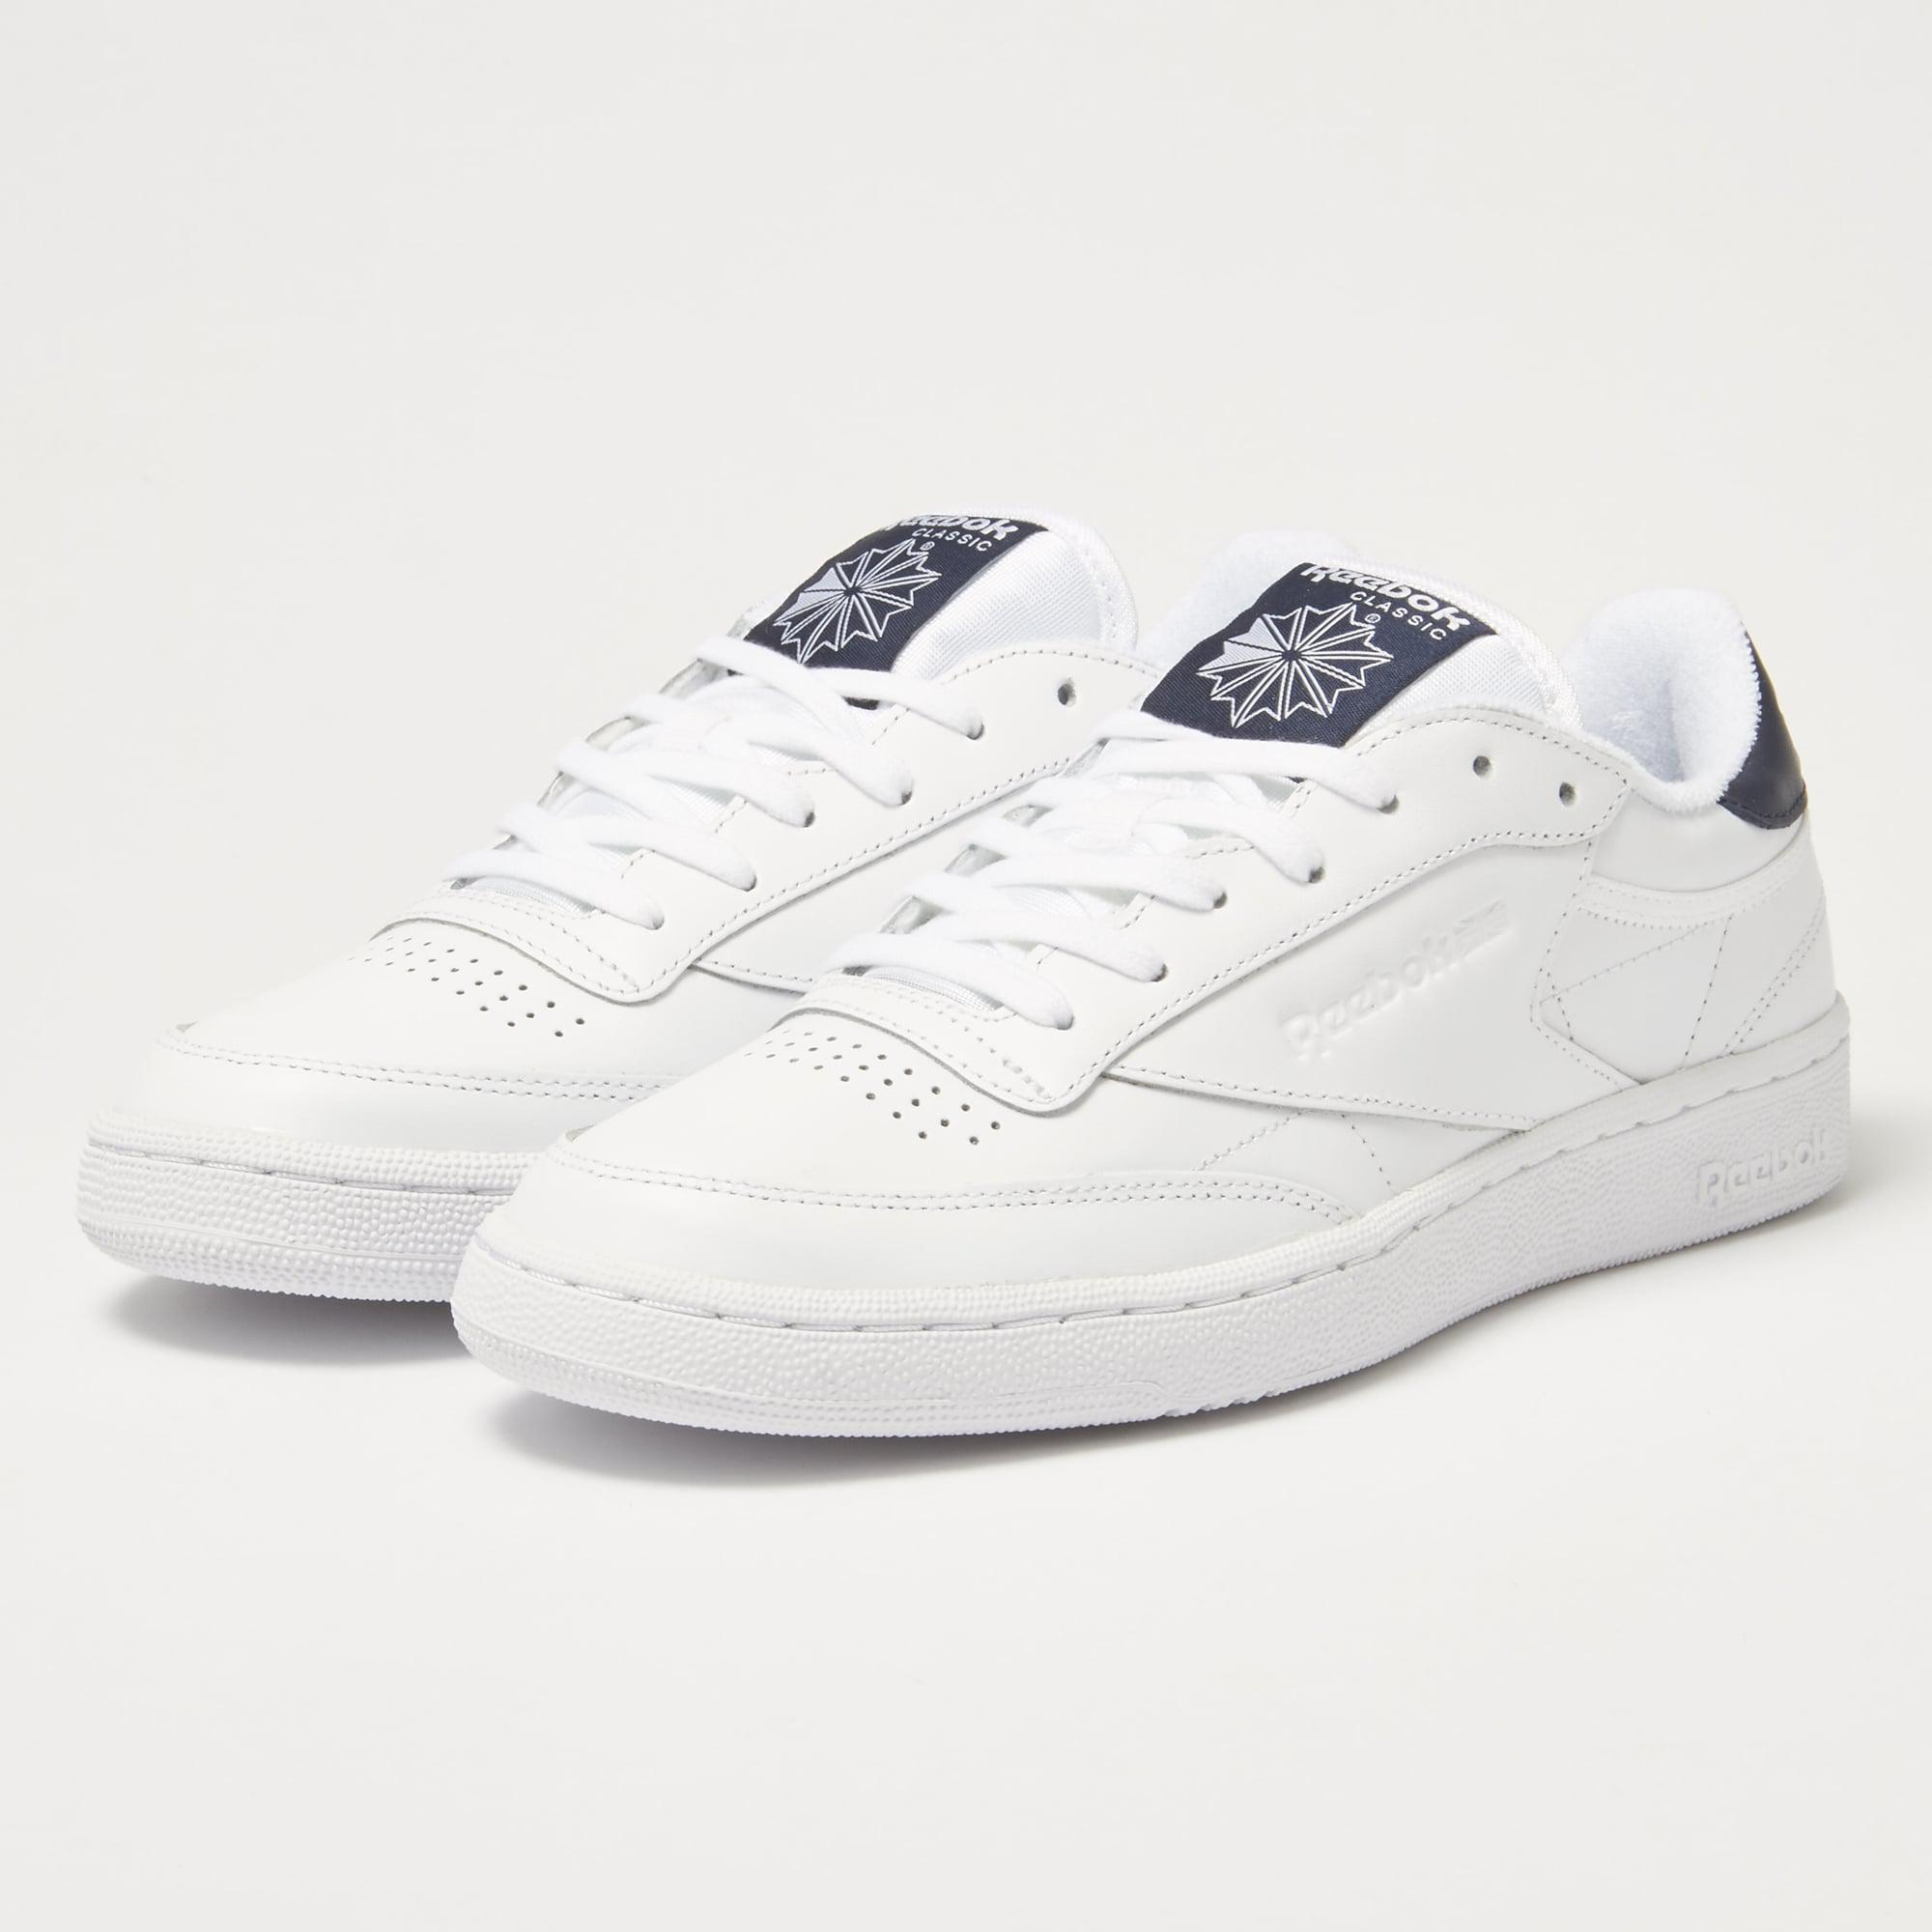 b80f78bd06f464 Lyst - Reebok Club C85 El White Sneakers Bd5688 in White for Men